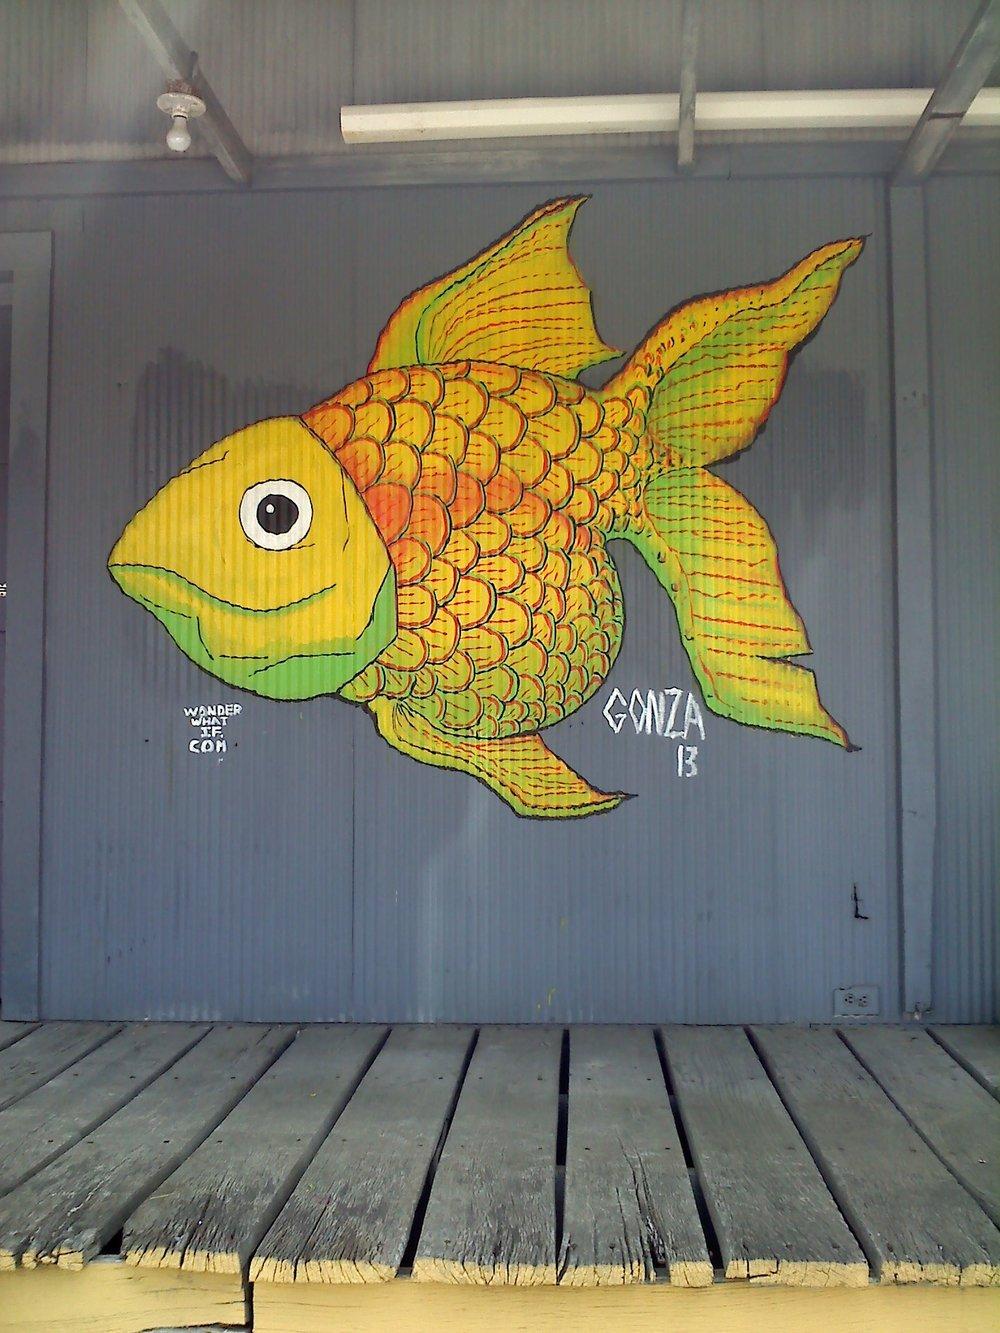 Fish-Mural-Concord-gonza-wonderwhatif.jpg